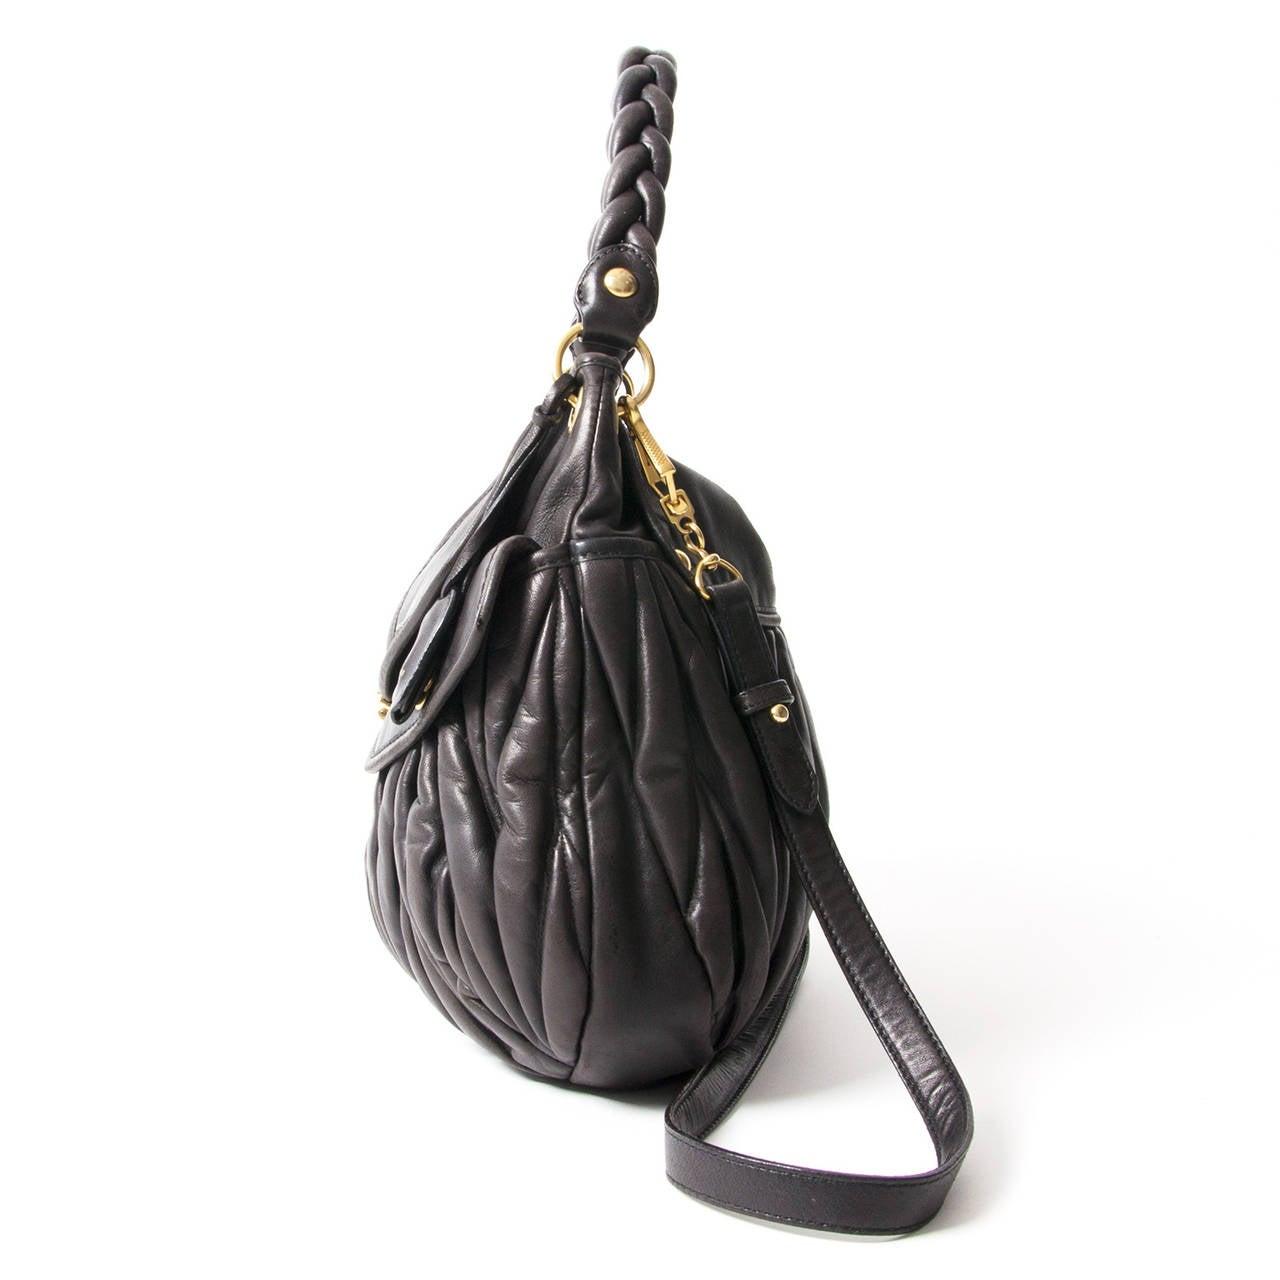 4741038281b3 This Miu Miu Coffer Matelasse bag beautiful smooth and soft black lambskin  eather and gold hardware